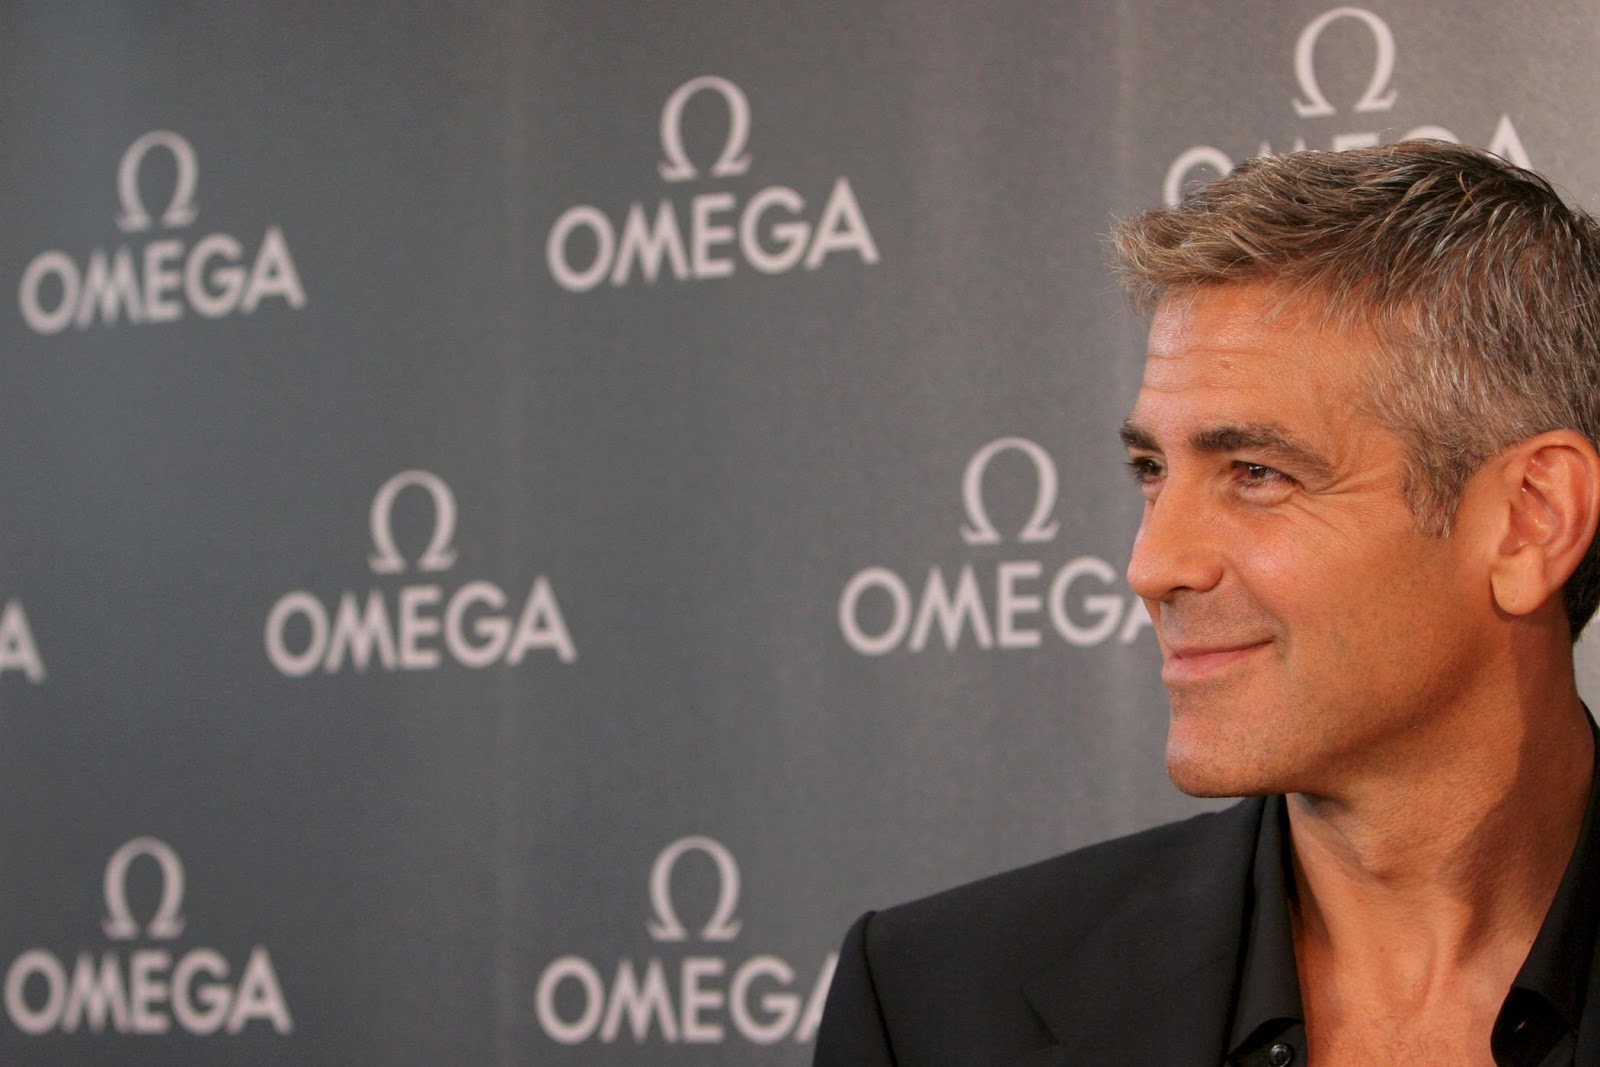 http://2.bp.blogspot.com/-zZZiIMsKK1Q/TpHHzPgl6QI/AAAAAAAAFeA/YpHD-DeCs60/s1600/George+Clooney+2.jpeg